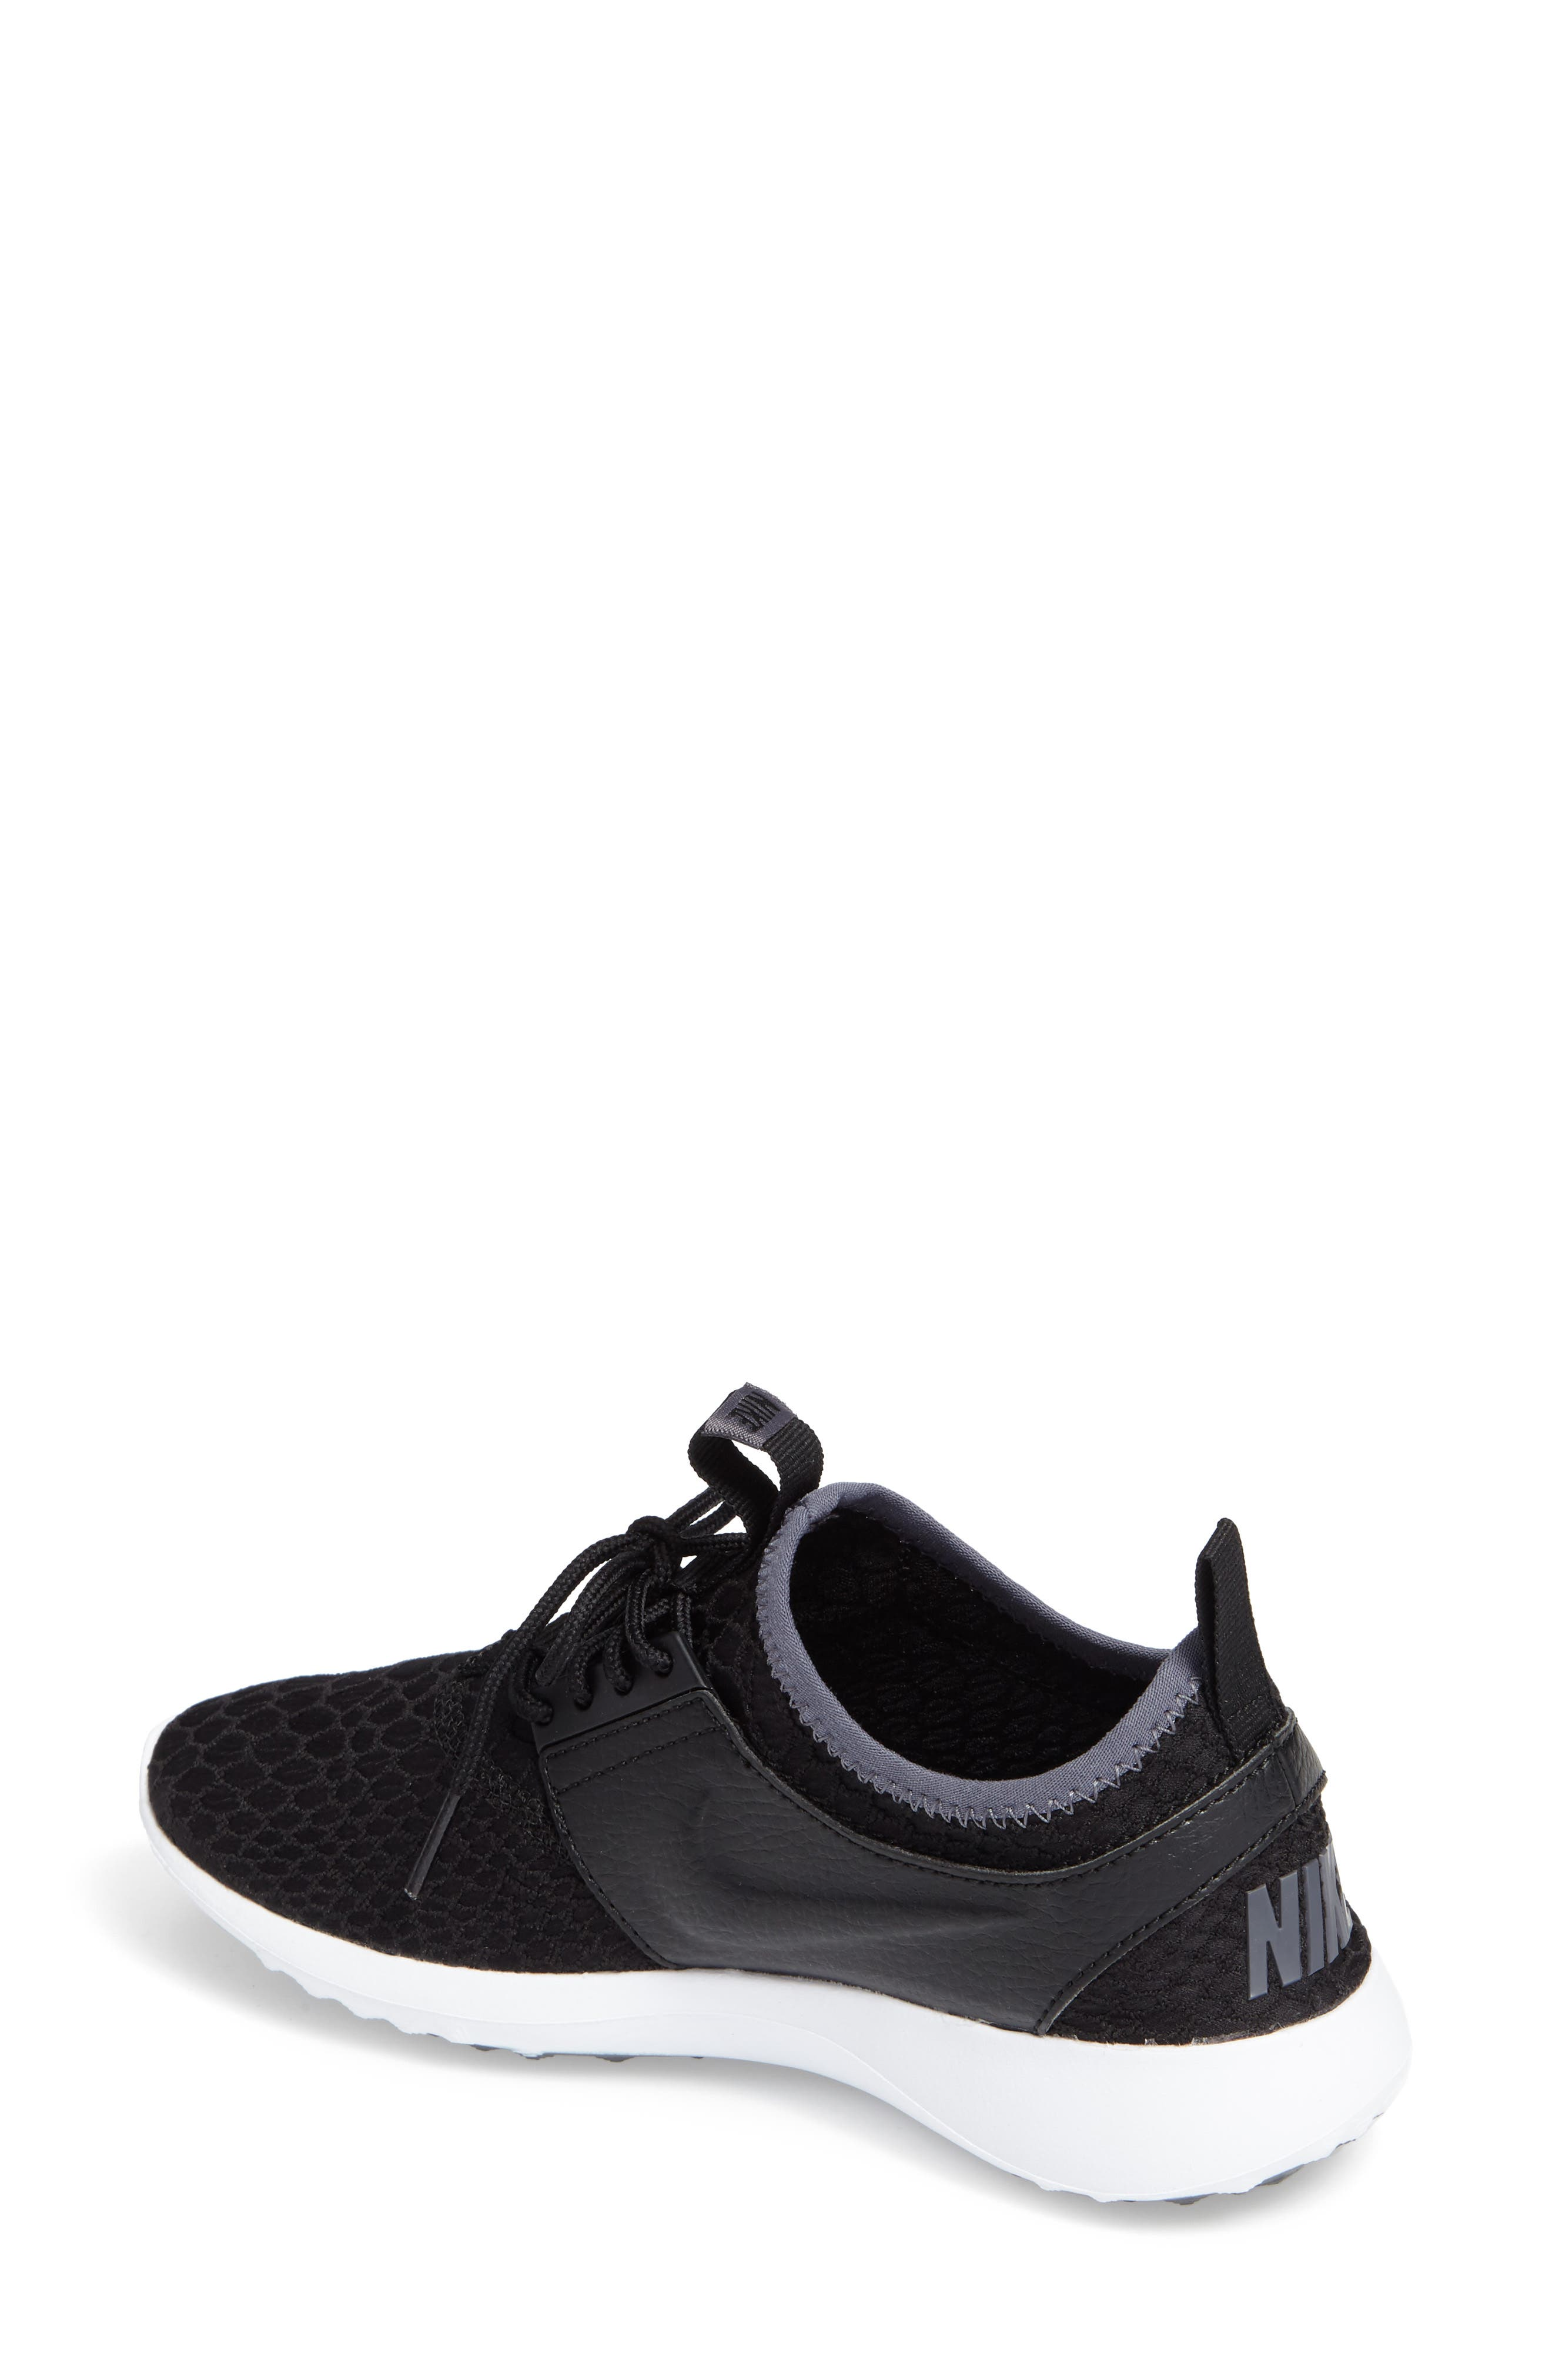 Juvenate SE Sneaker,                             Alternate thumbnail 17, color,